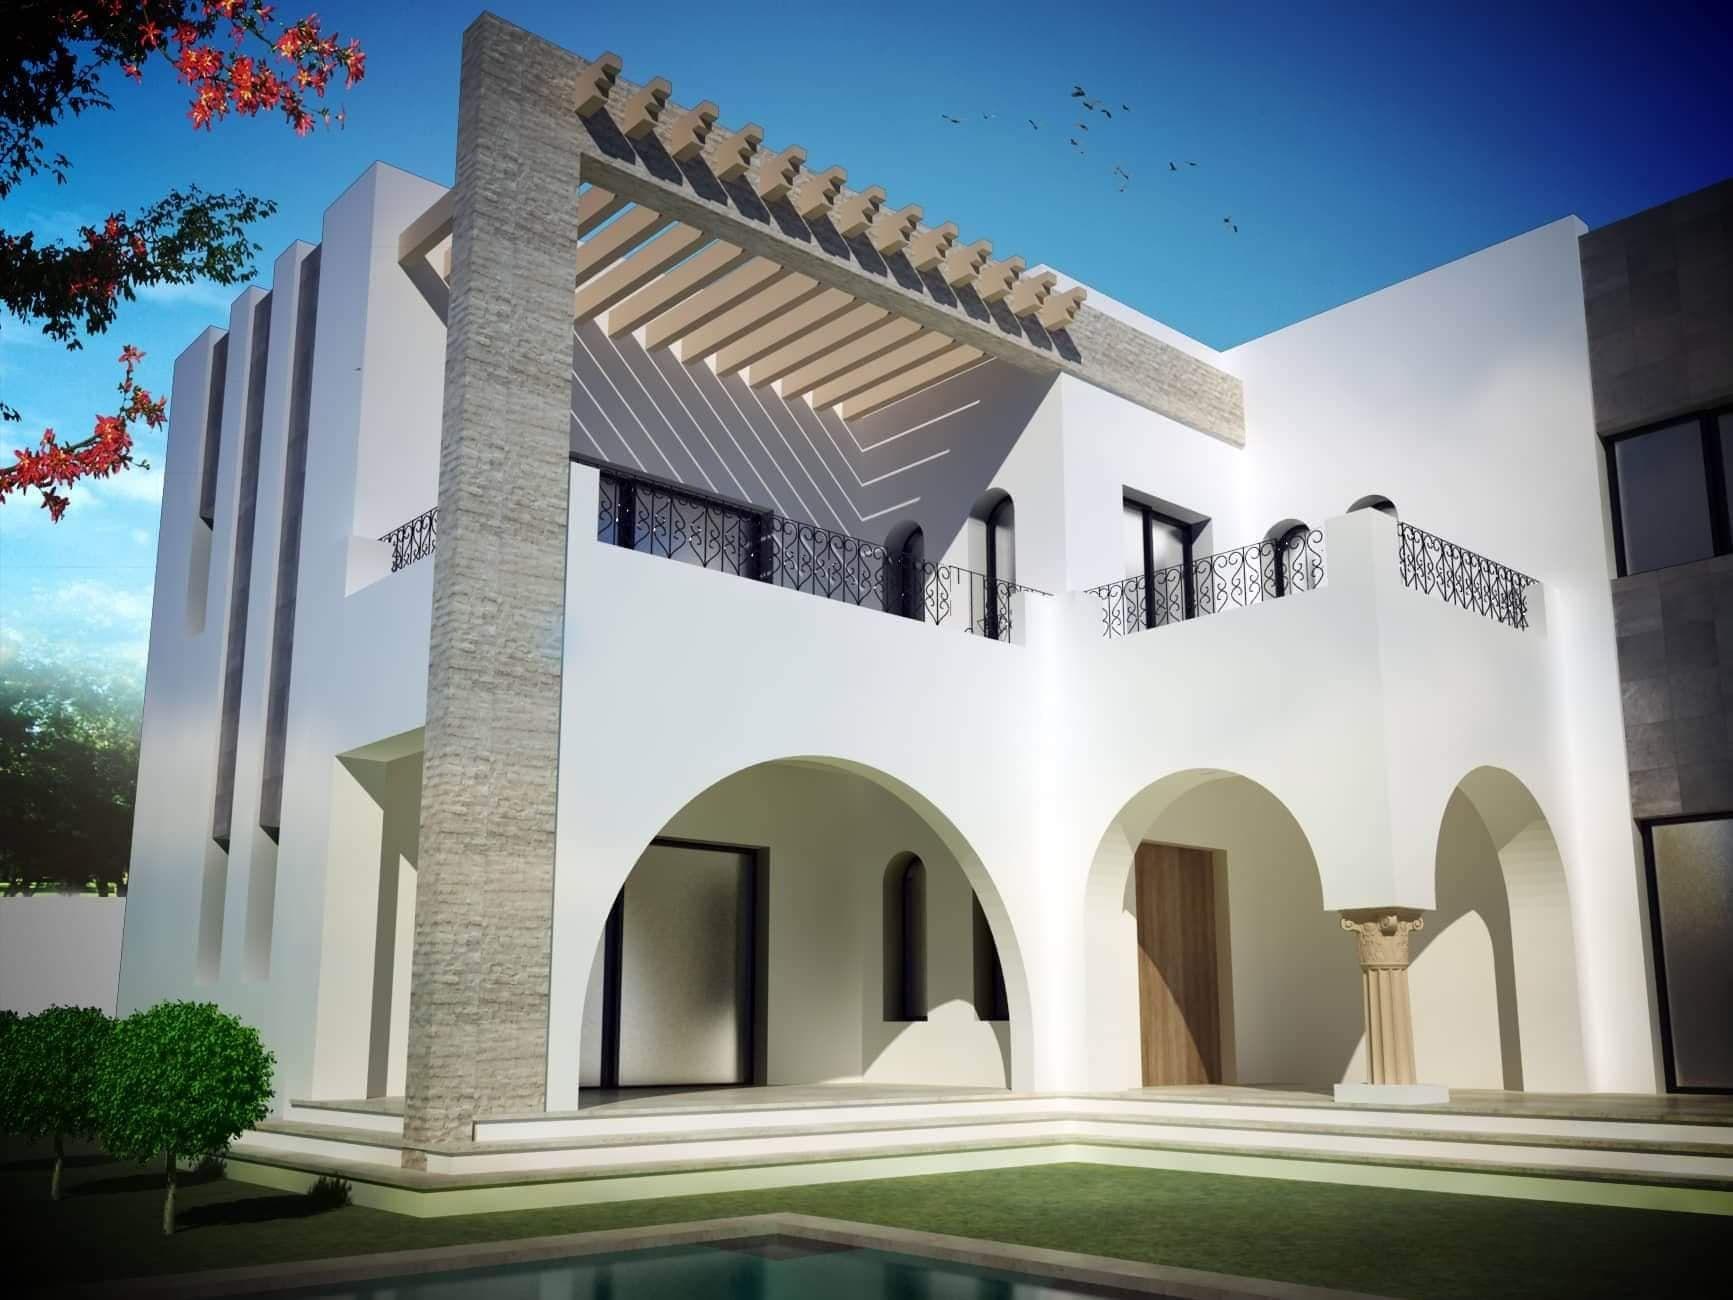 Villa brunella 2 réf:  hammamet opportunité